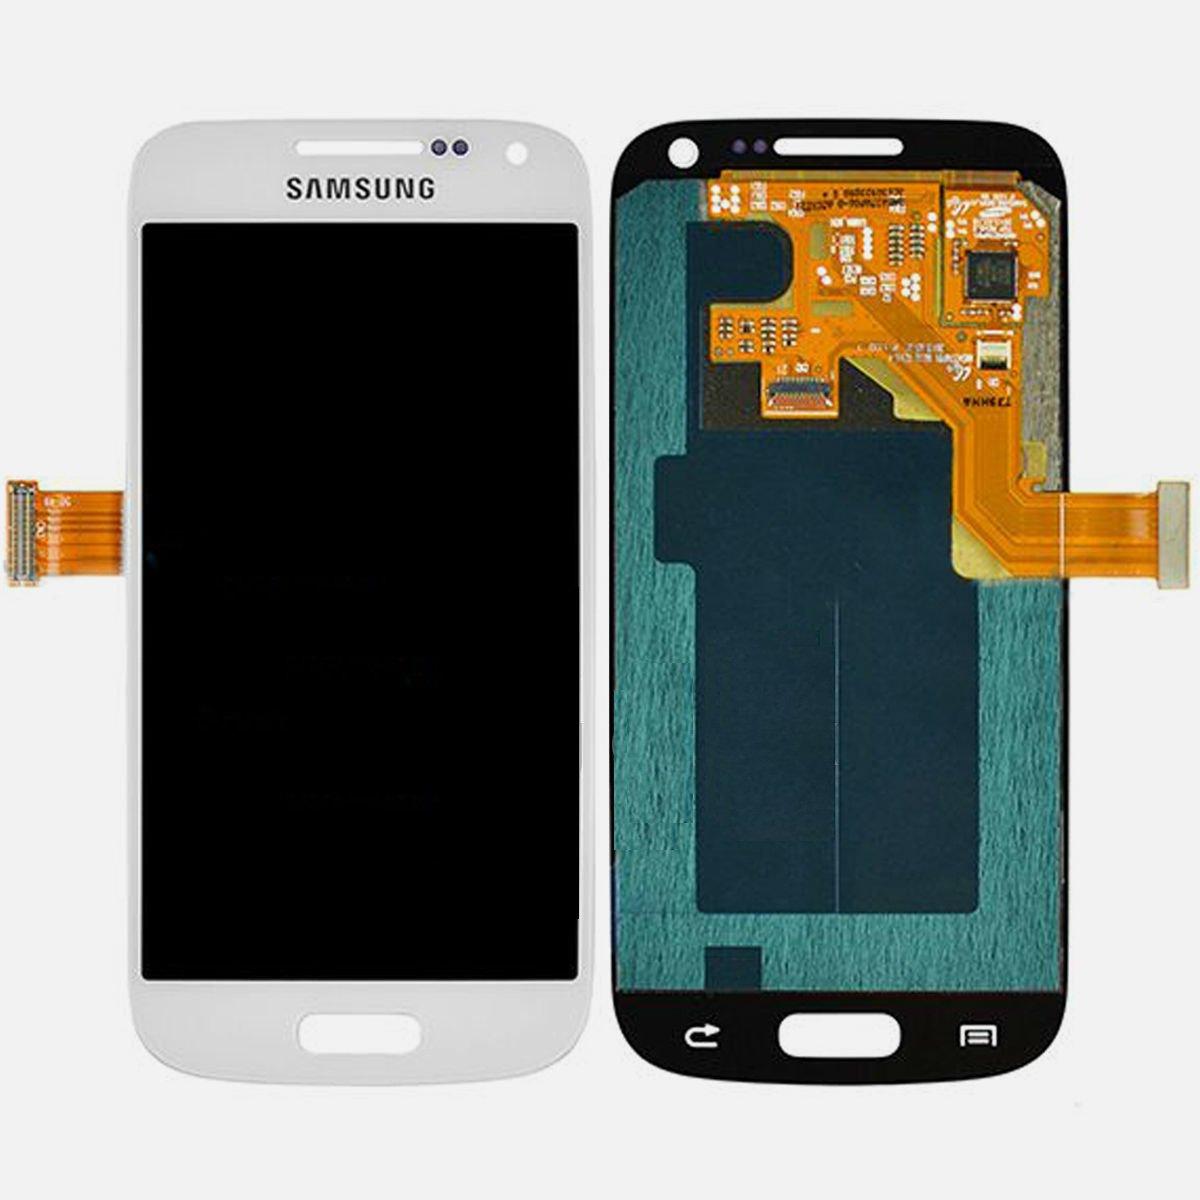 Samsung Galaxy S4 Mini i9190 i9192 i9195 LCD Display Digitizer Screen White